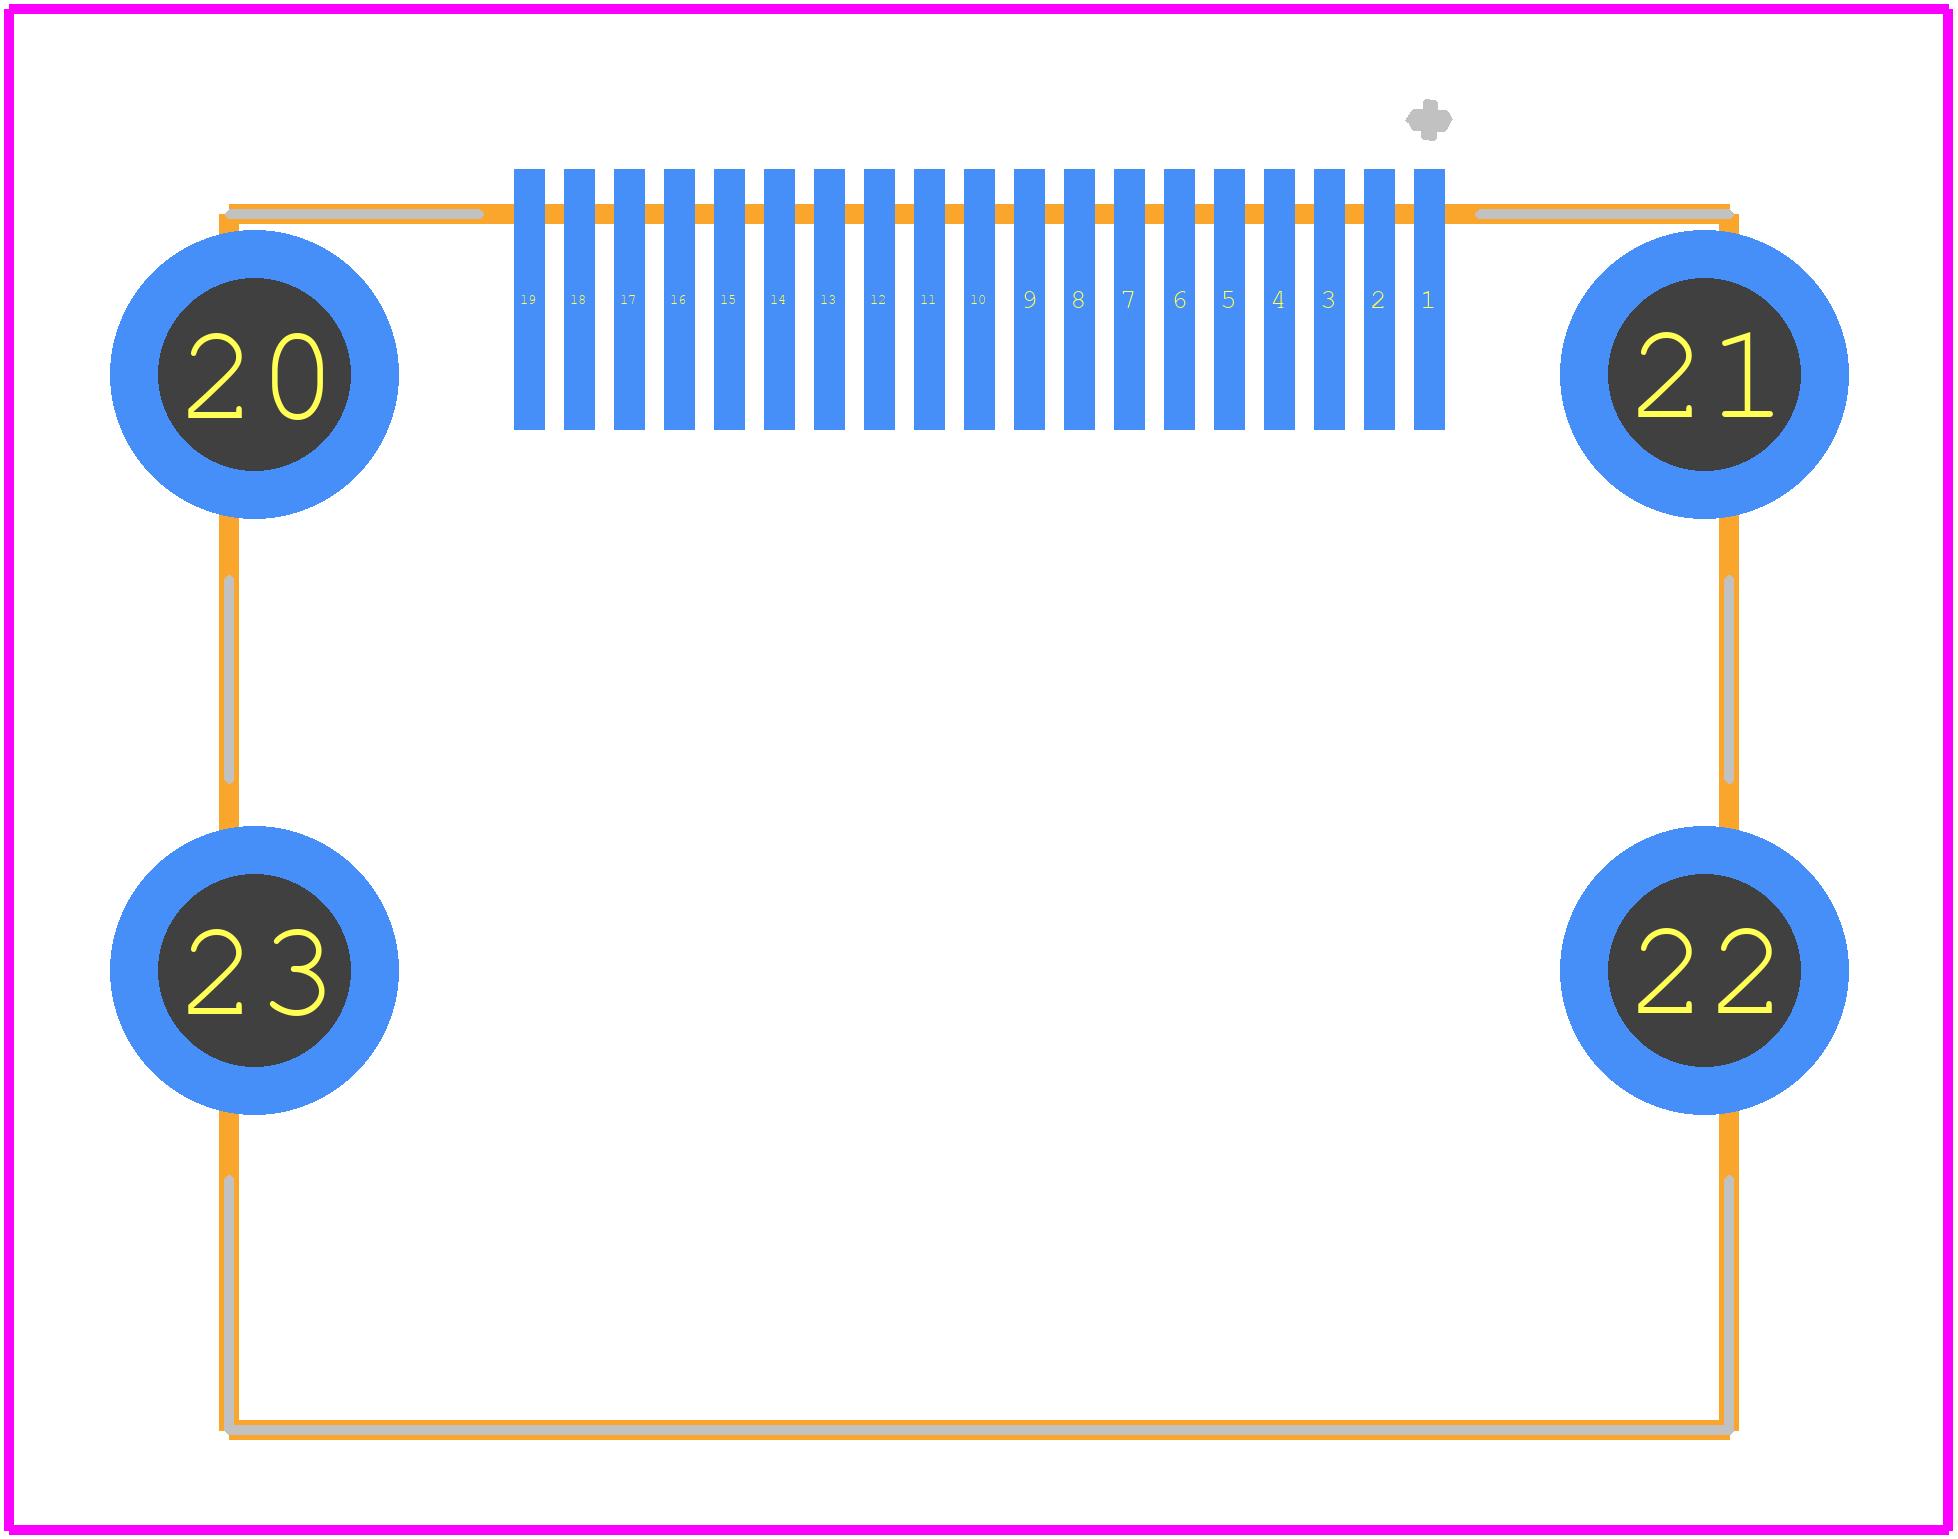 47151-1081 - Molex PCB footprint - Other - 47151-1081